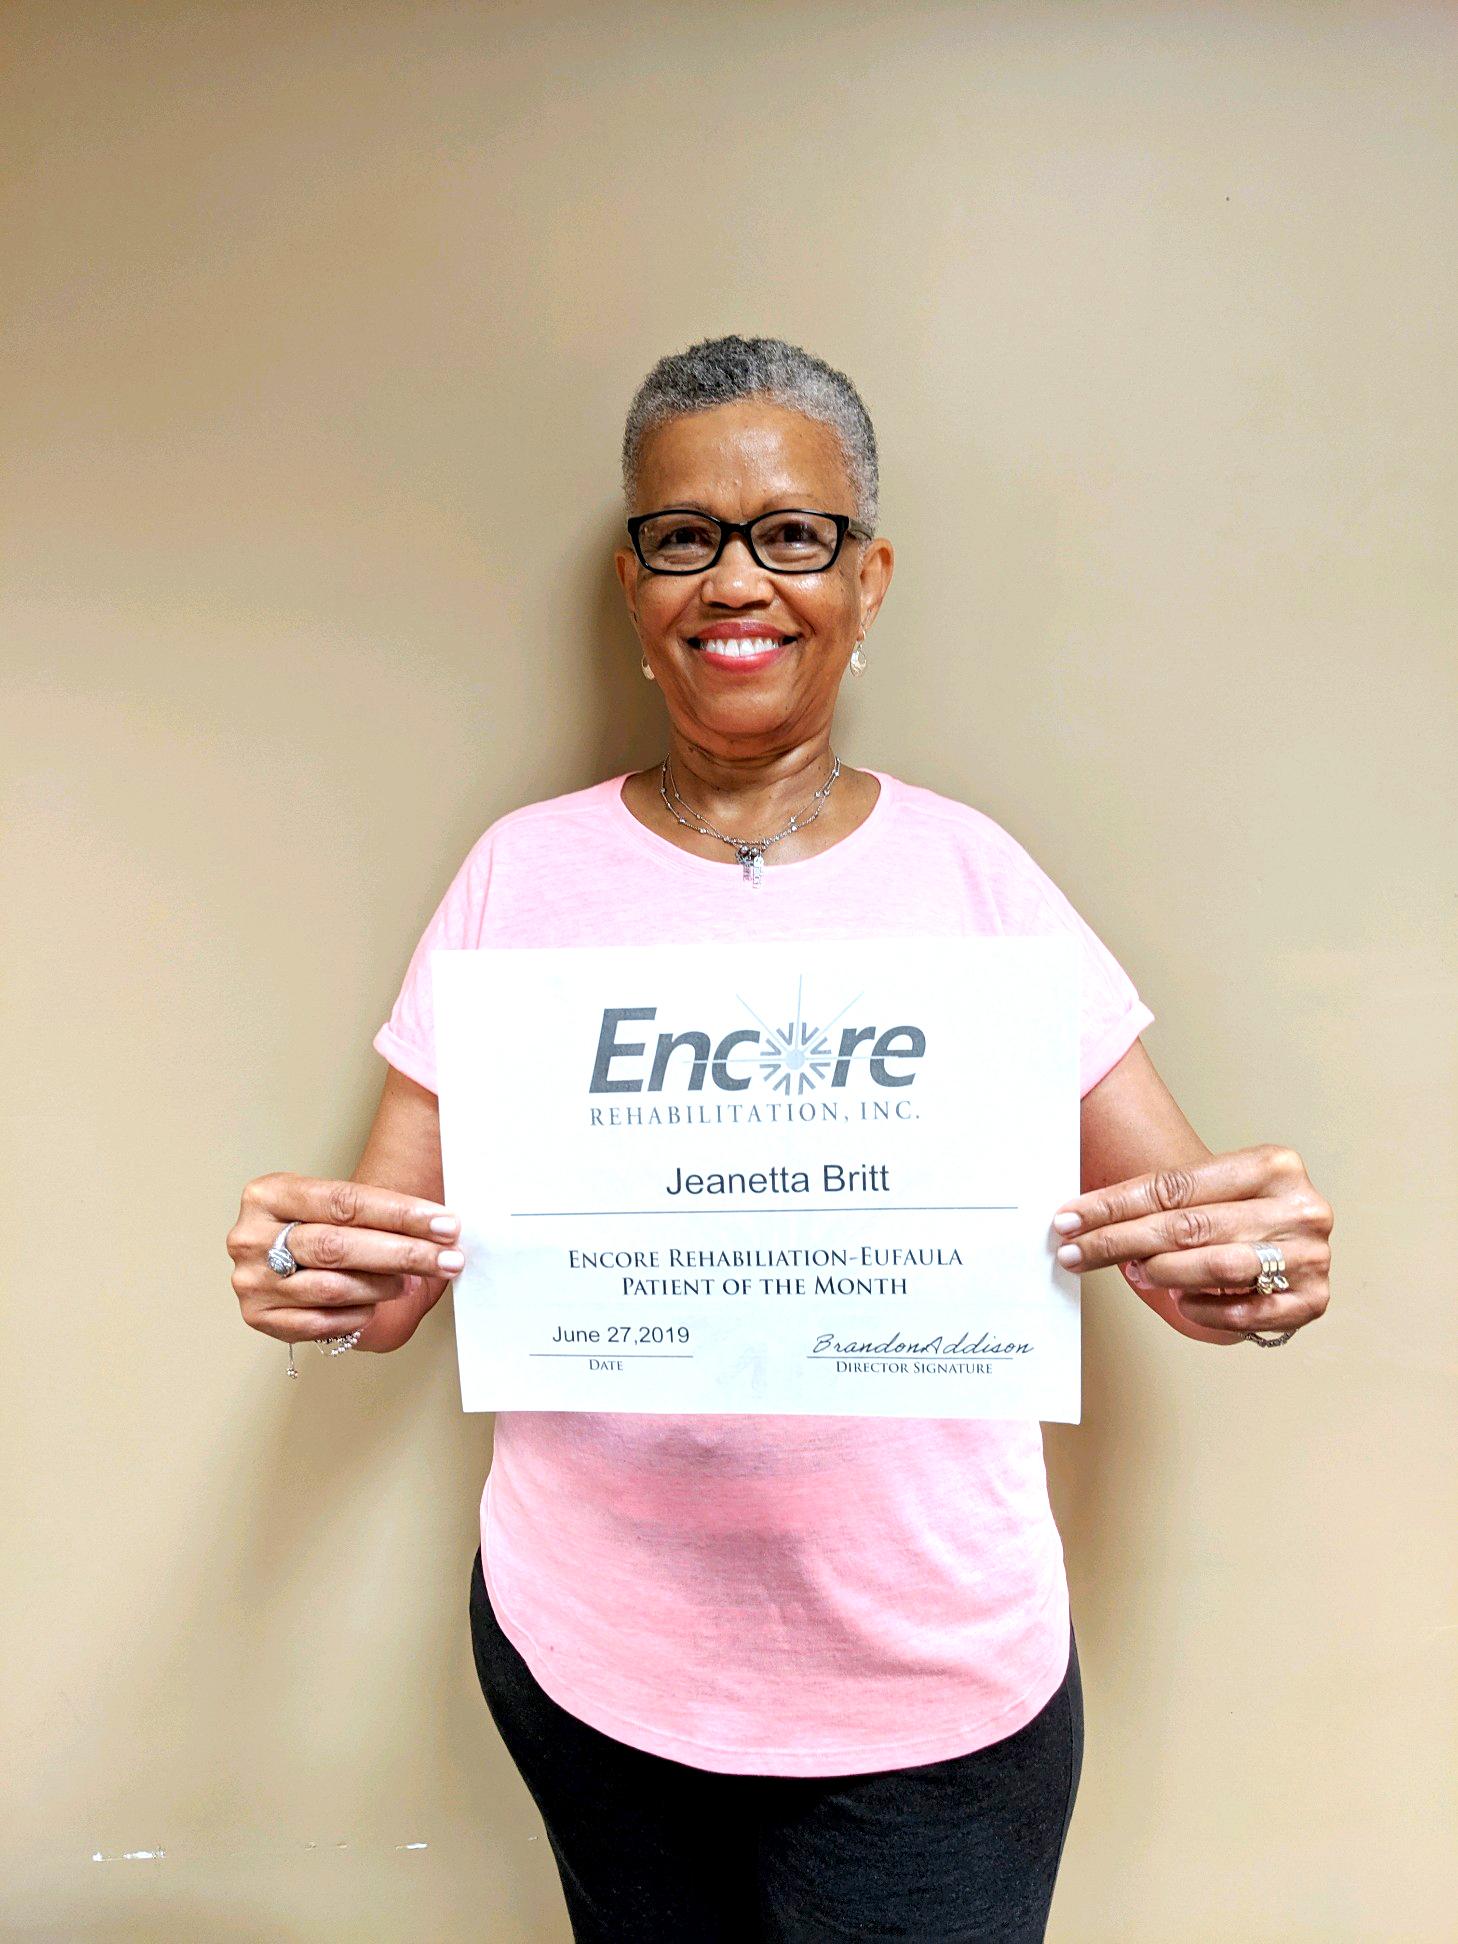 Jeanetta Britt is Patient of the Month for Encore Rehabilitation-Eufaula #EncoreRehab